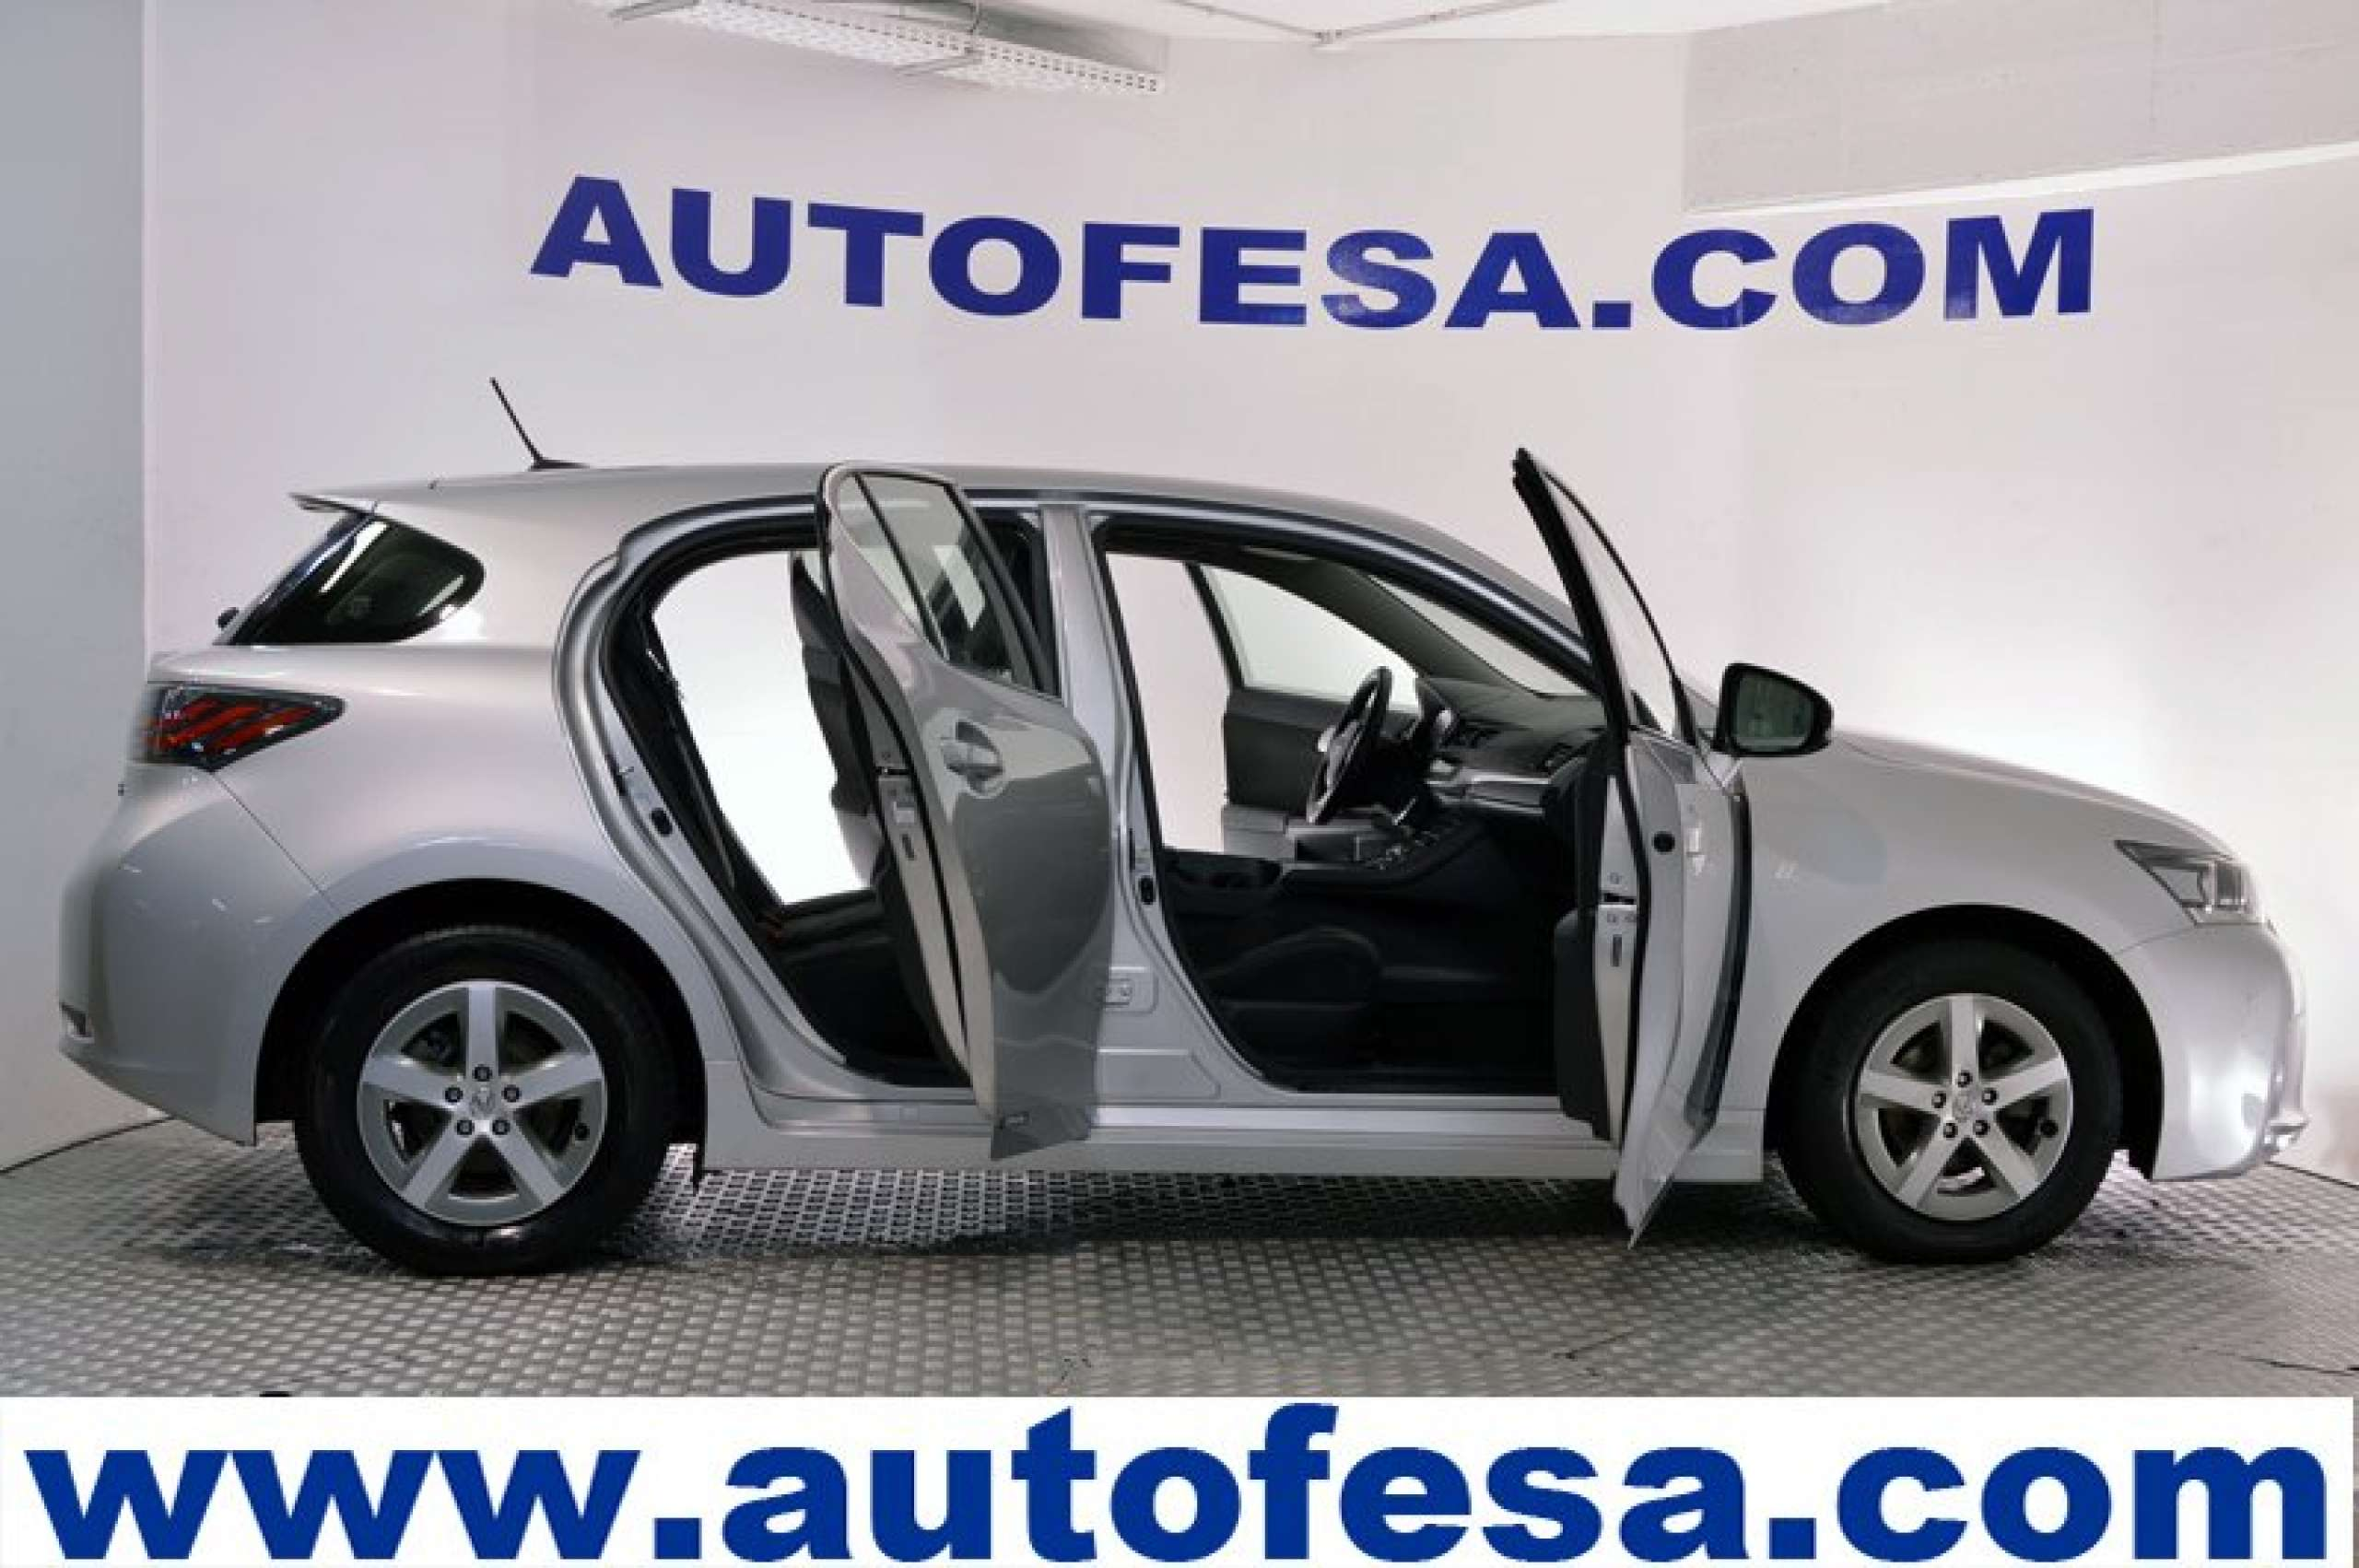 Lexus Ct 200h 1.8 136cv Eco Auto 5p - Foto 11